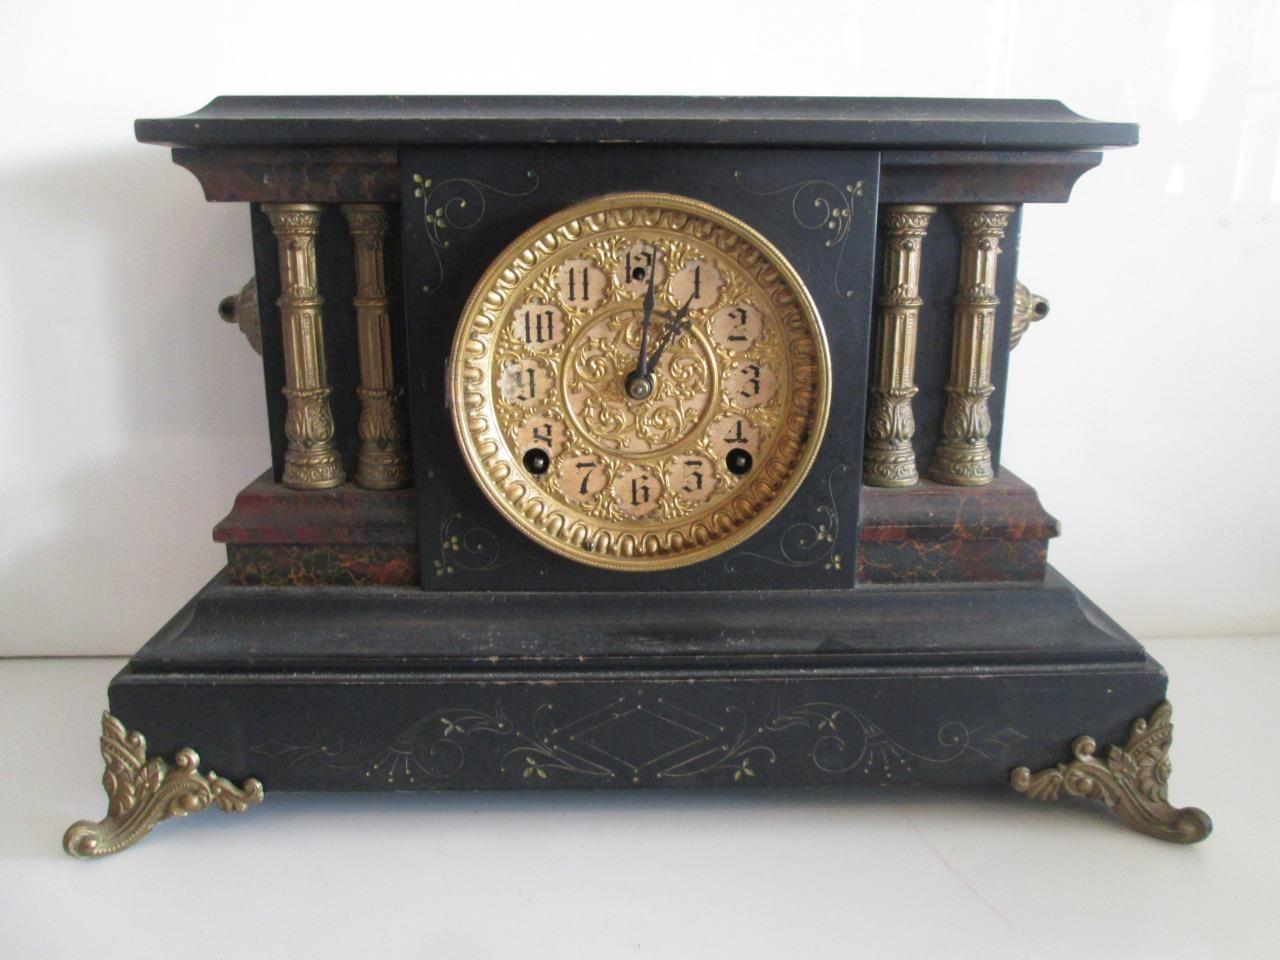 Antique Sessions Clock Co Fs Black Mantle Clock W Marbleized Wood Columns Nr Ebay Mantel Clocks Clock Mantle Clock